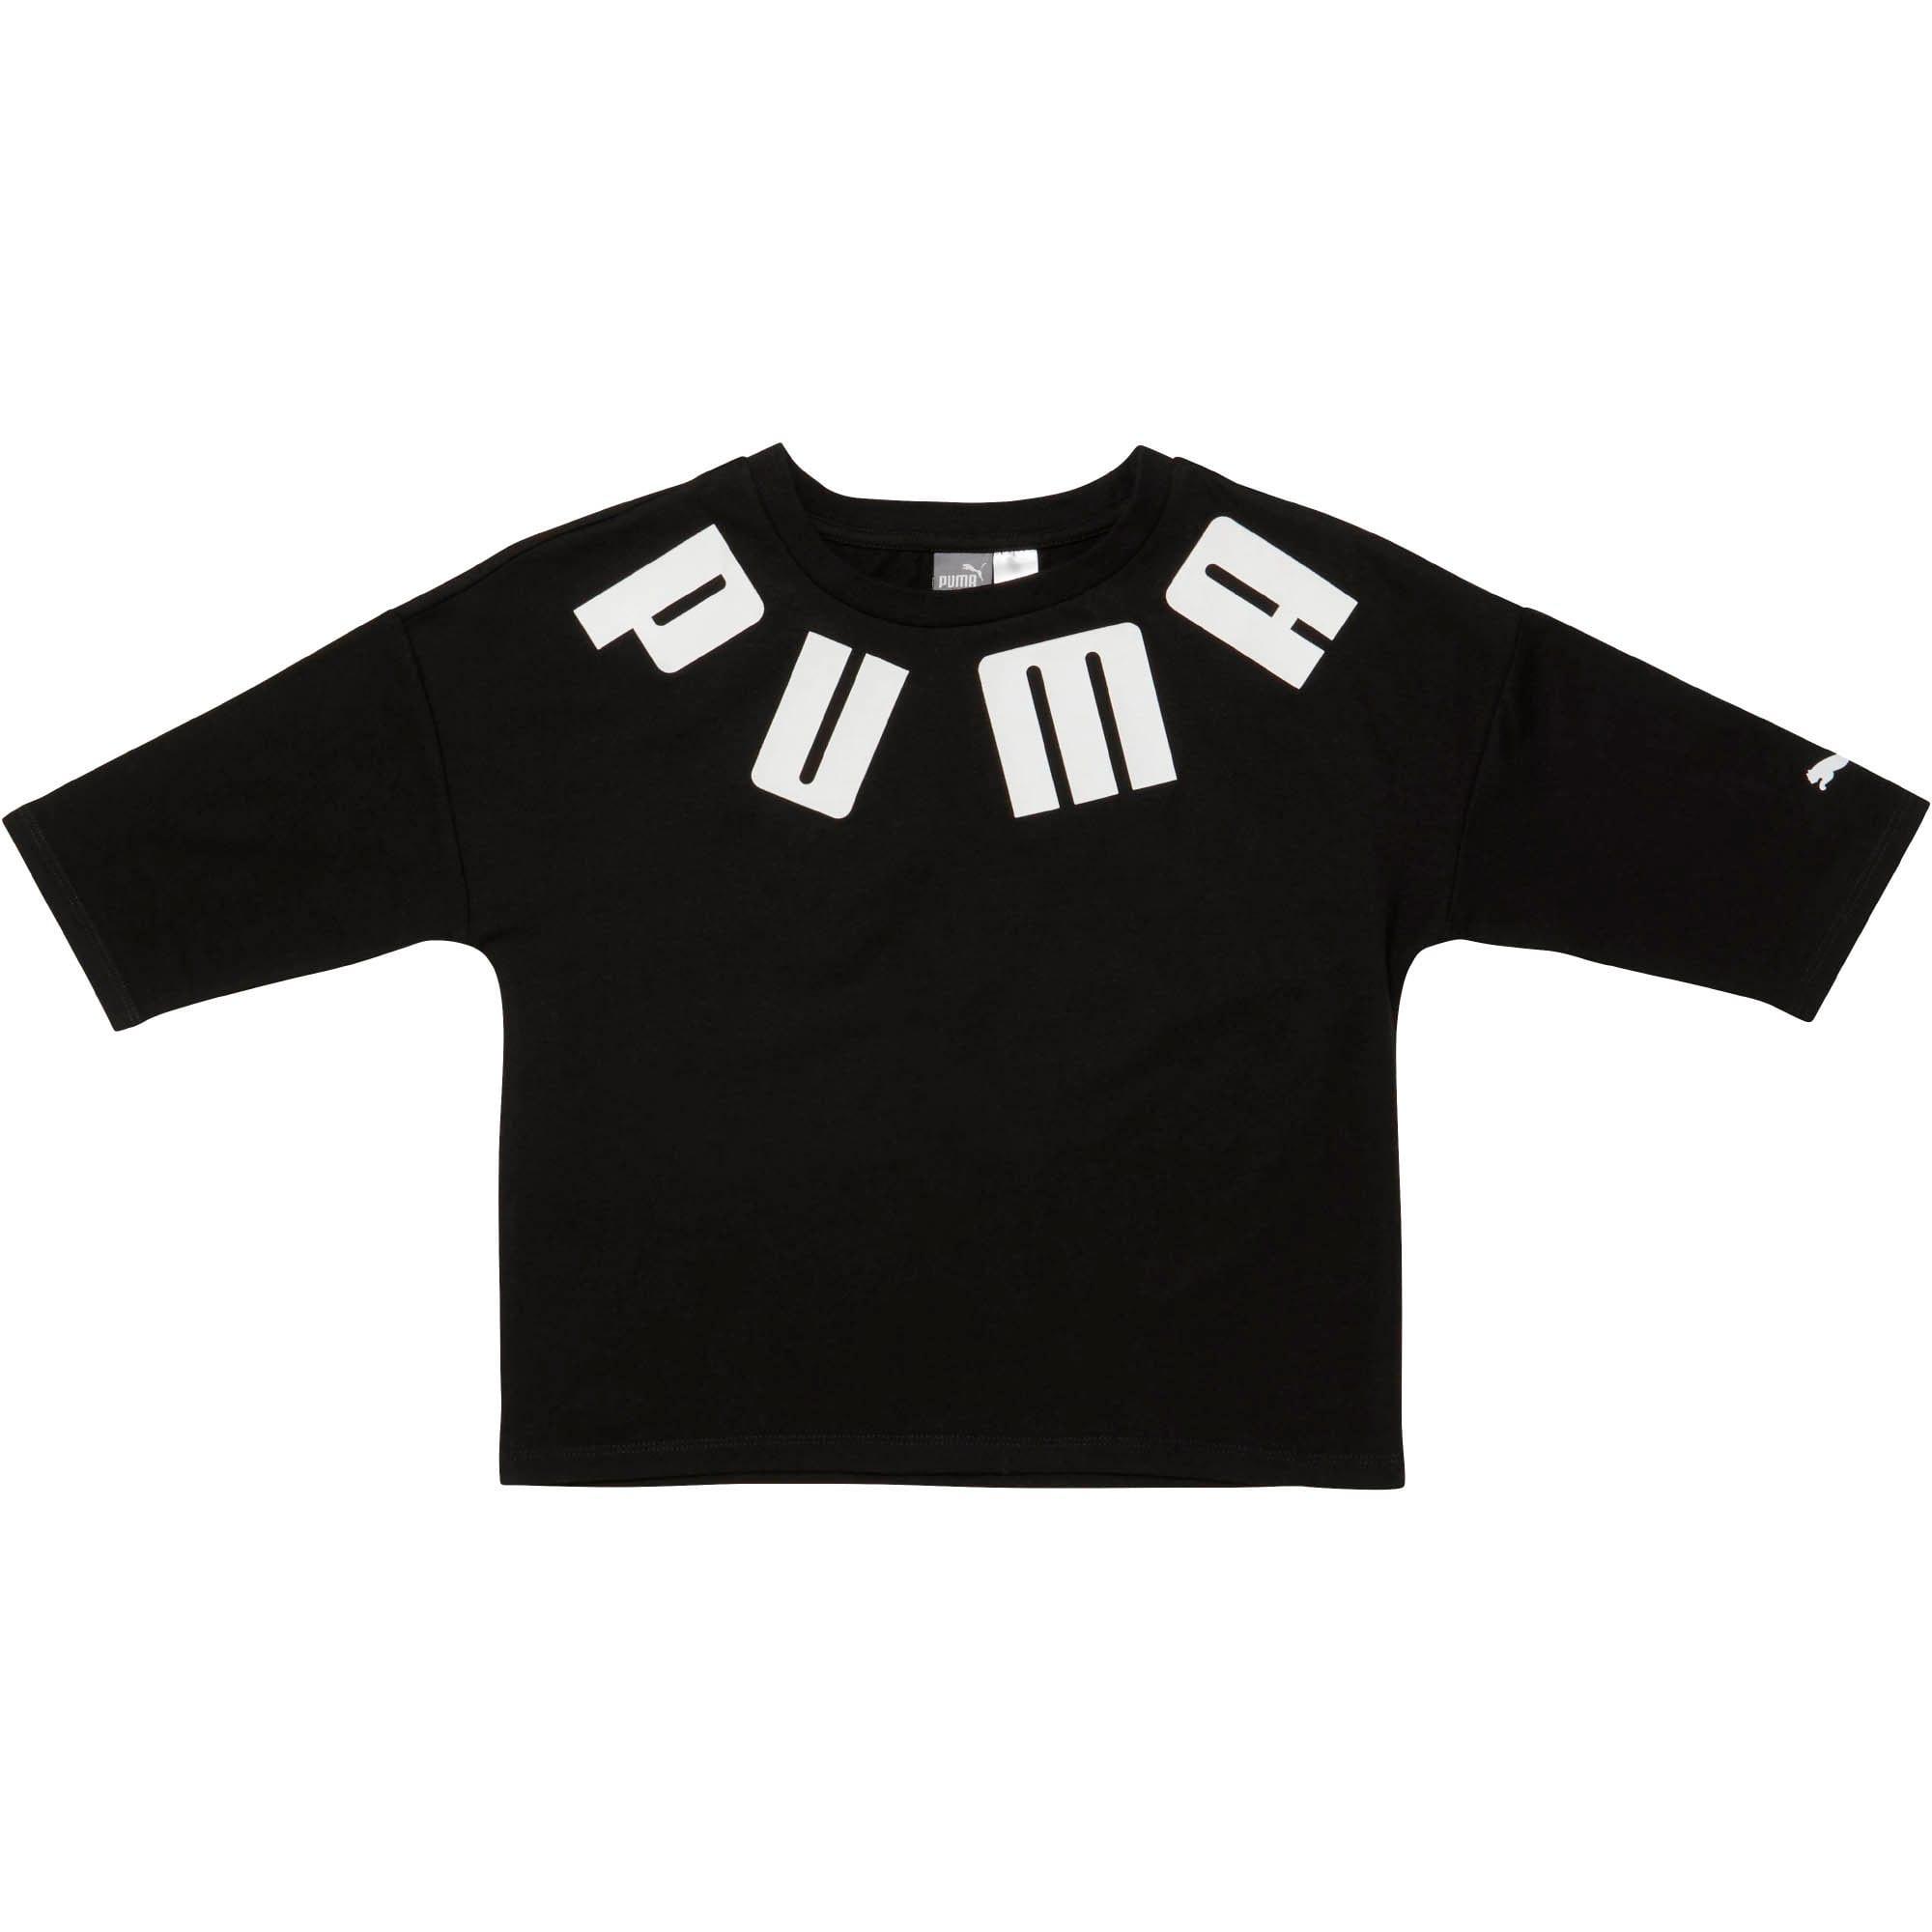 Thumbnail 1 of LuXTG Girls' Fashion Tee JR, PUMA BLACK, medium